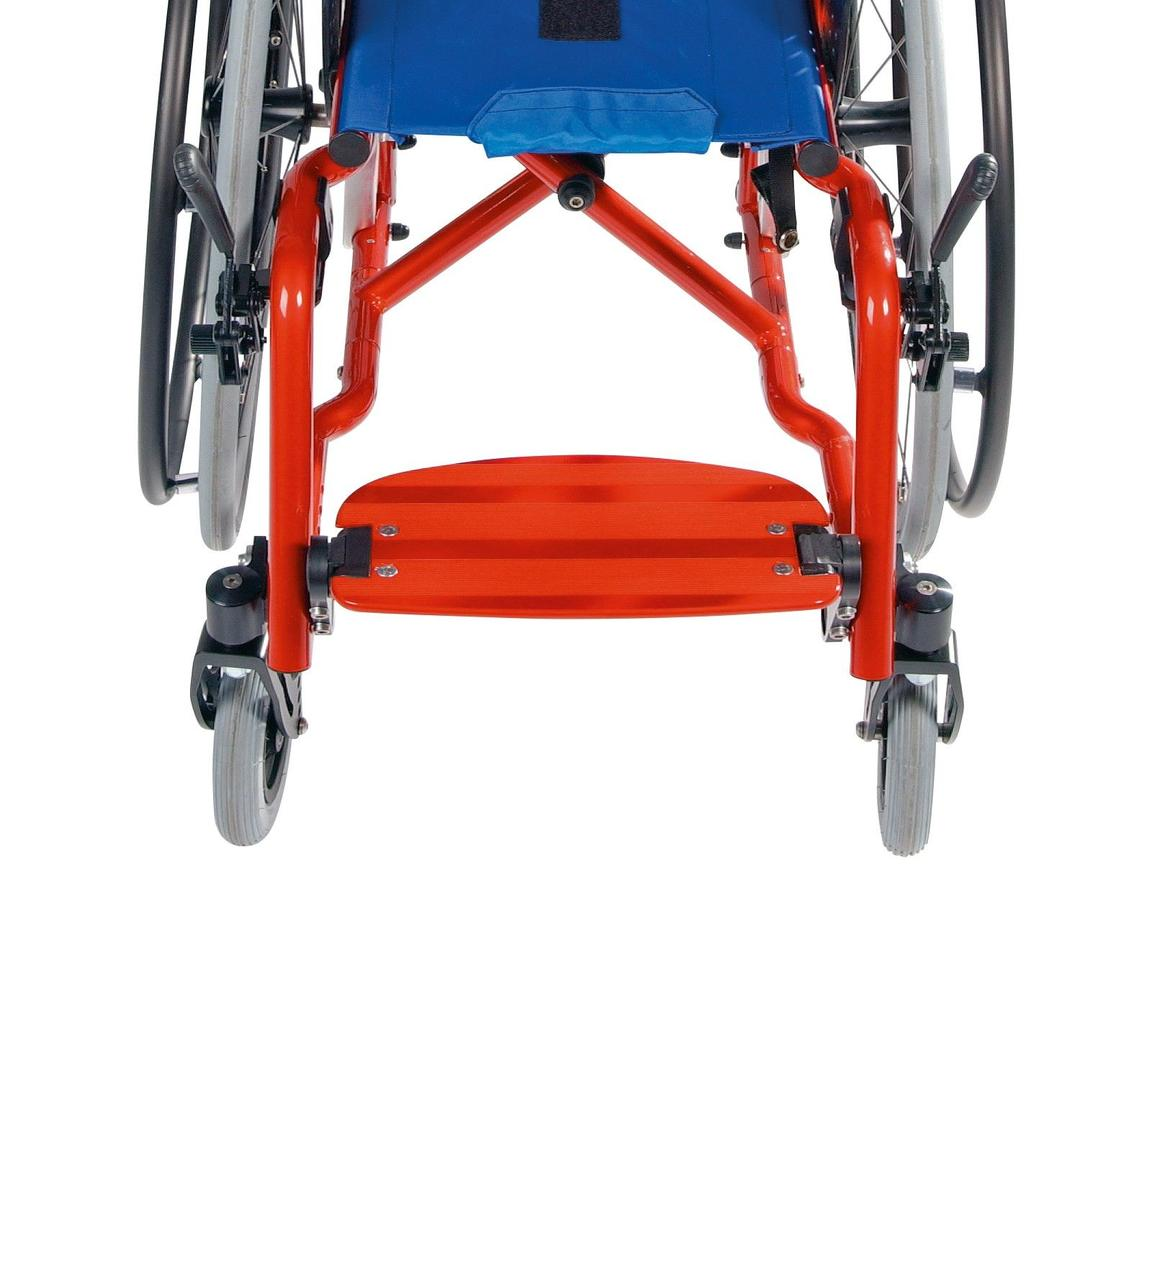 Кресло-коляска Otto Bock АВАНГАРД ТИН активного типа для детей и подростков - фото 6